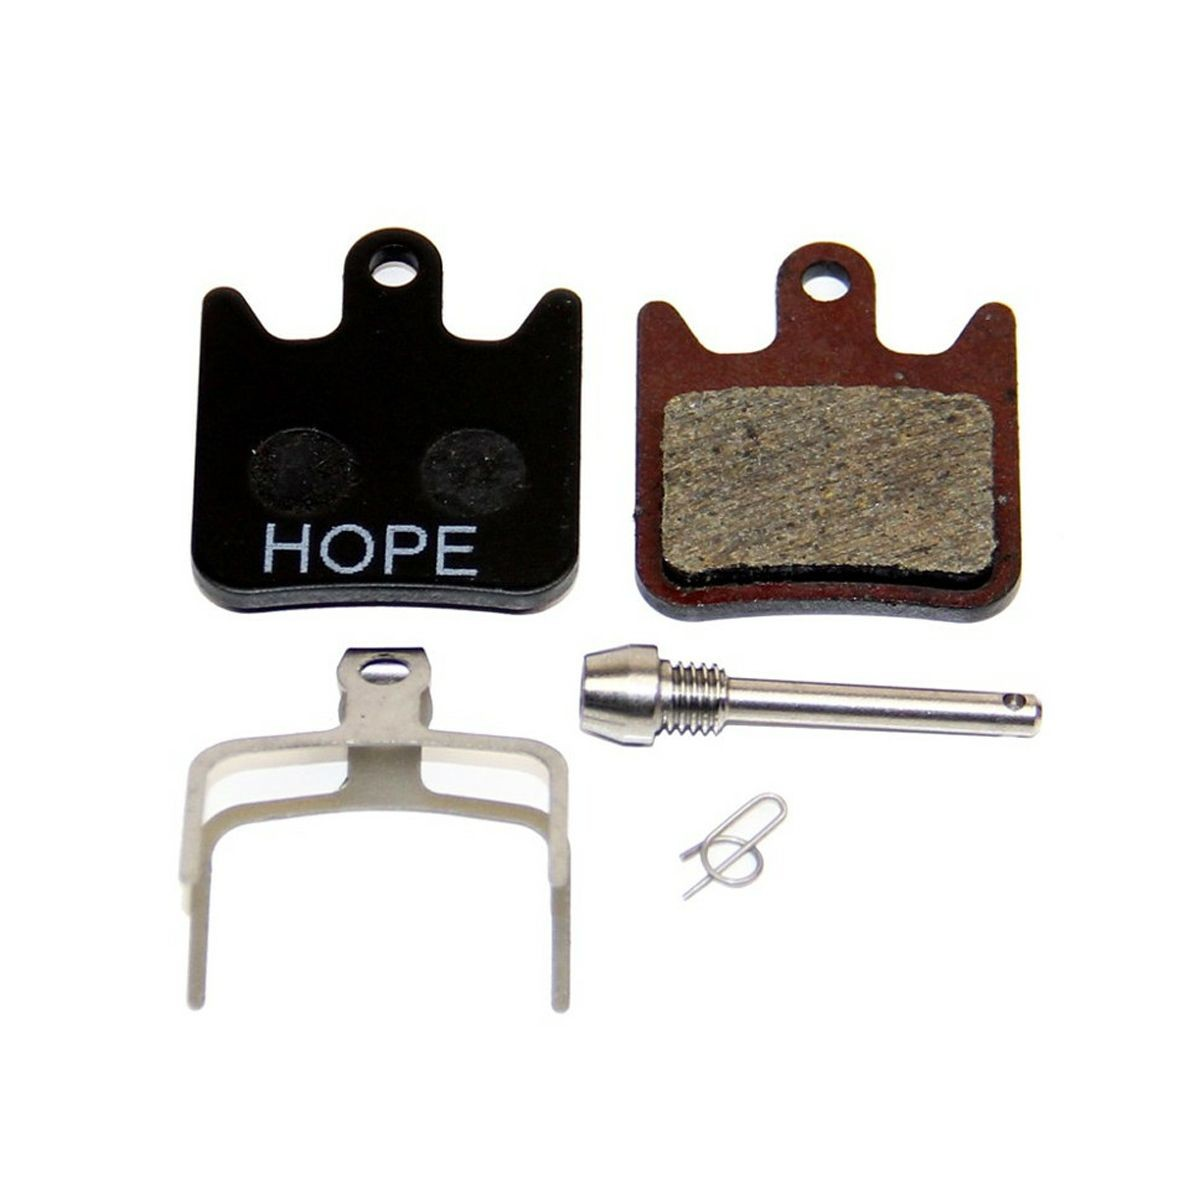 HOPE X2 STANDARD DISC BRAKE PADS